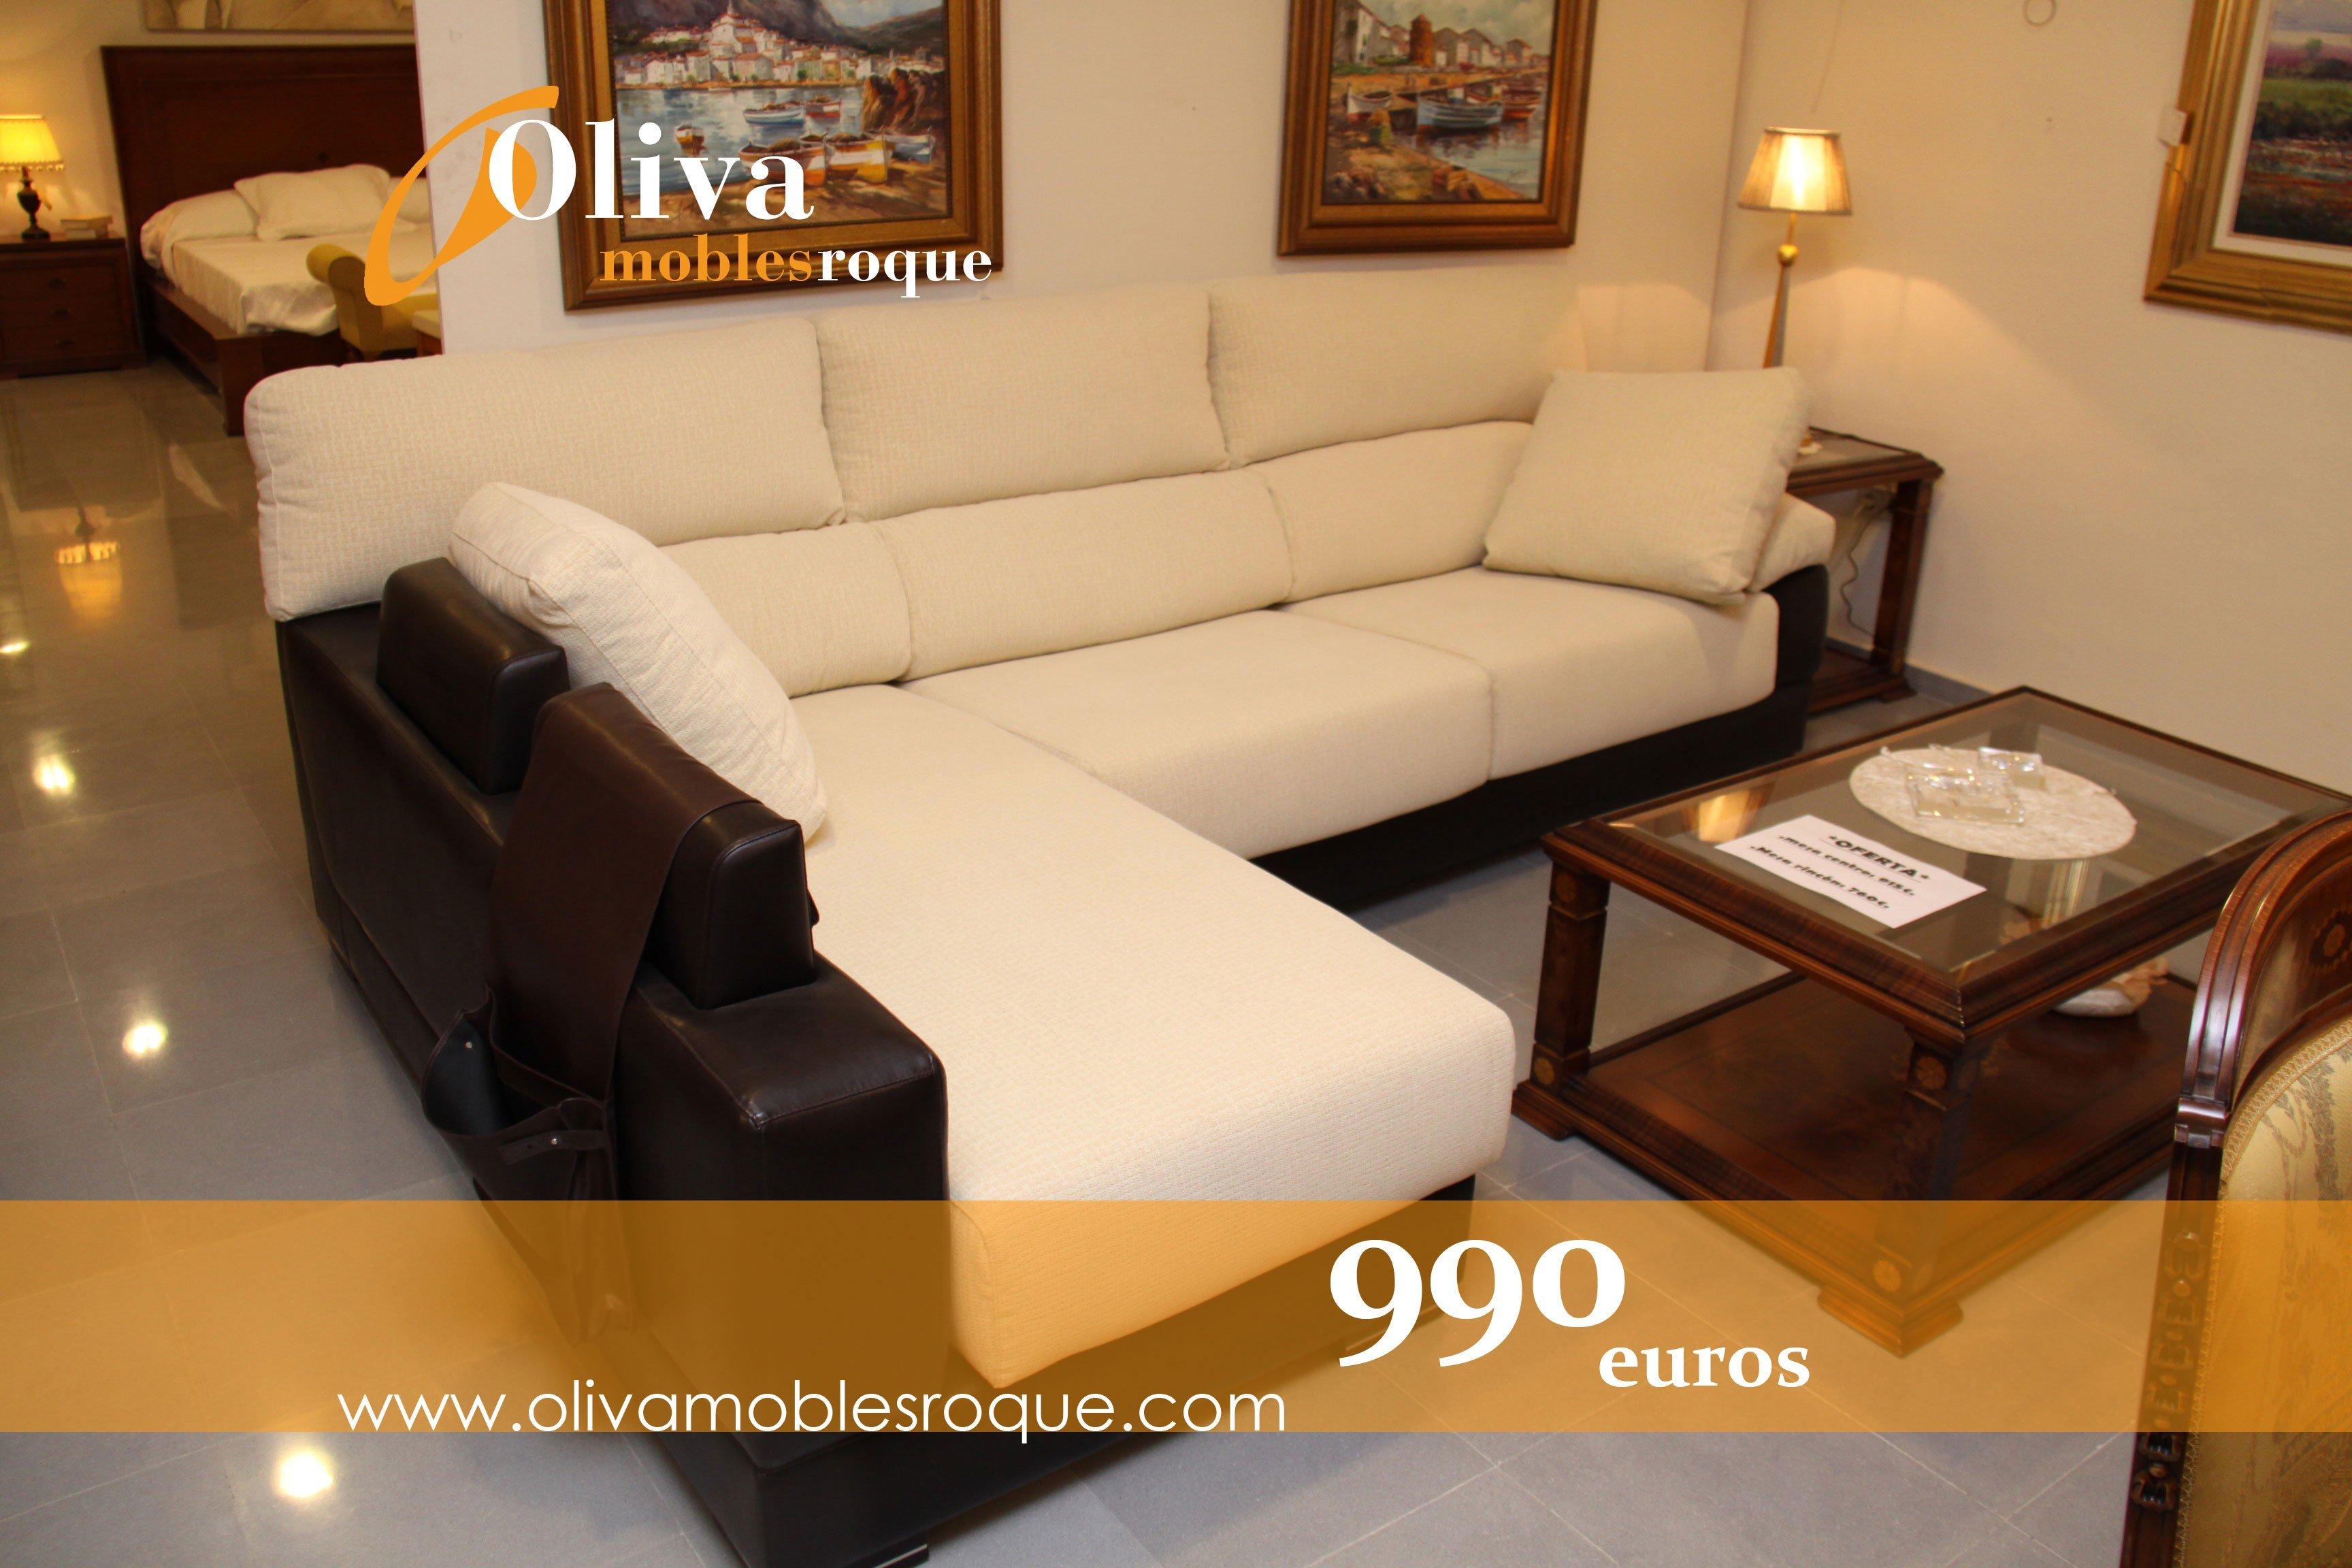 Oferta sofa chaise longue de ta quatro dise o a precio outlet for Chaise longue barcelona outlet